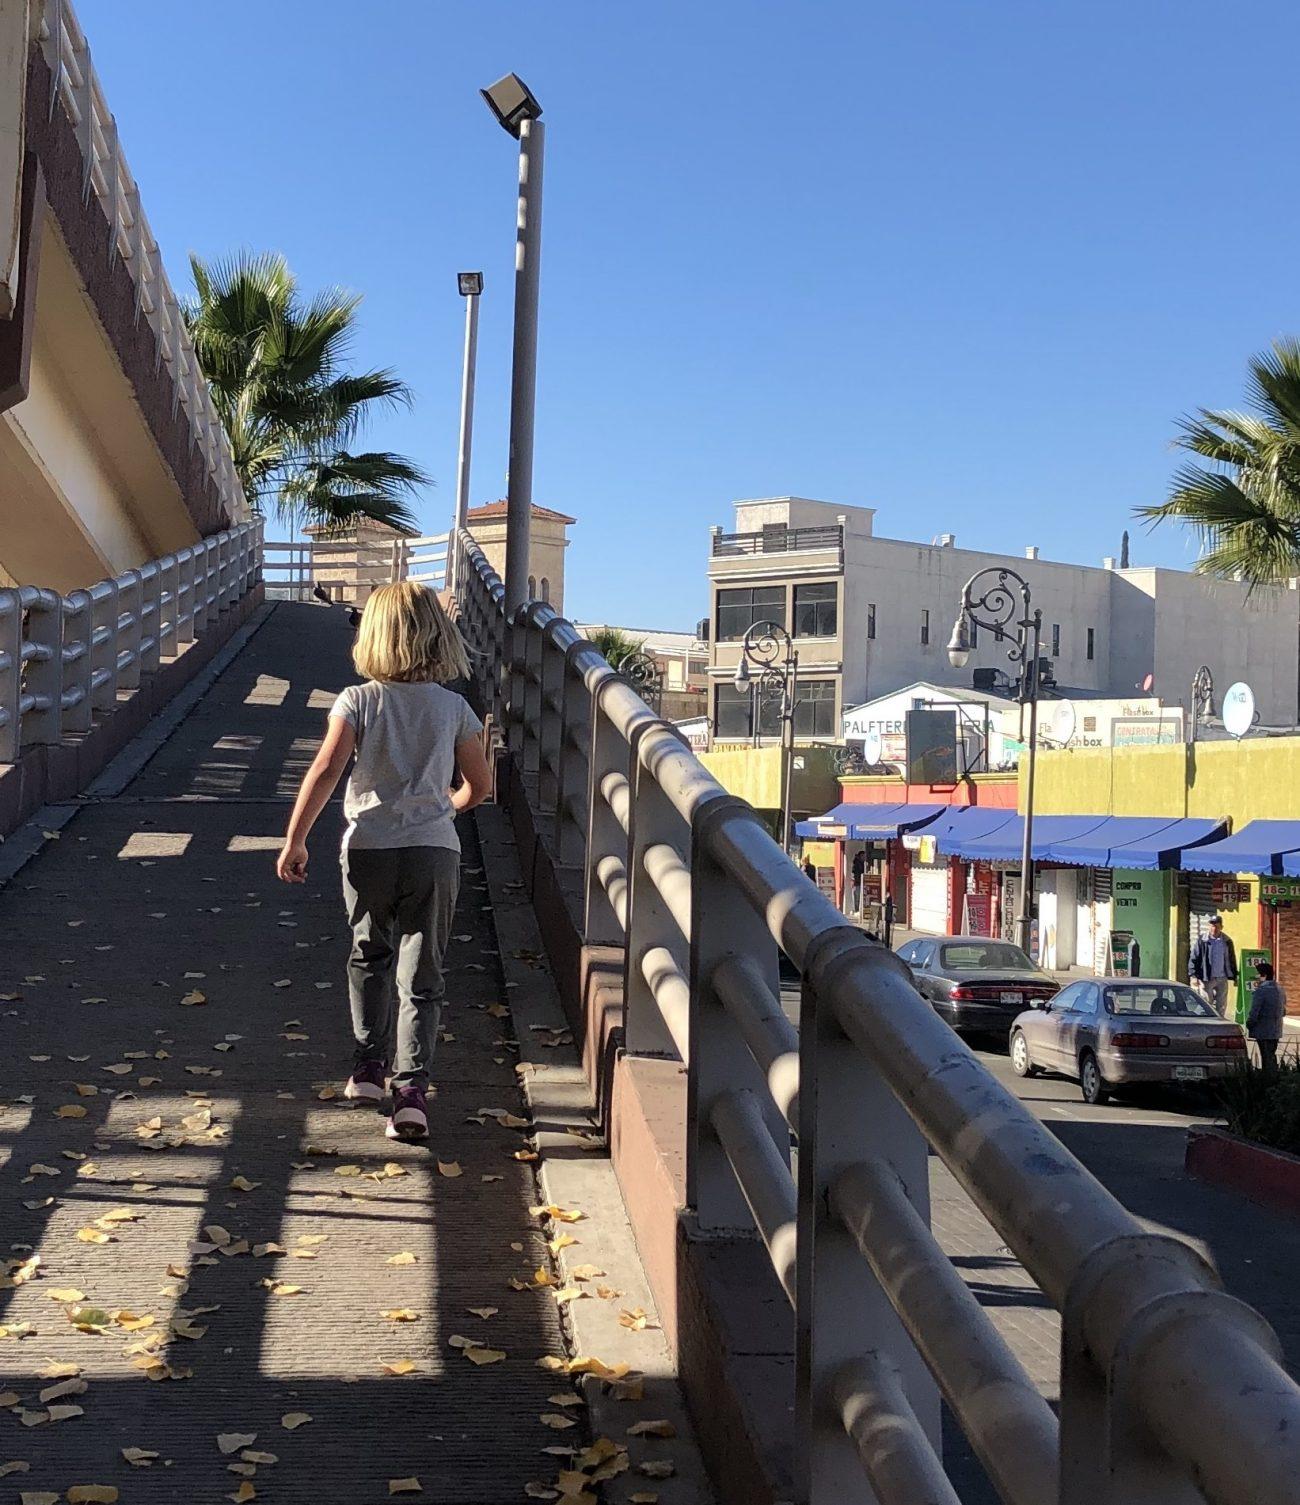 Visiting Mexico